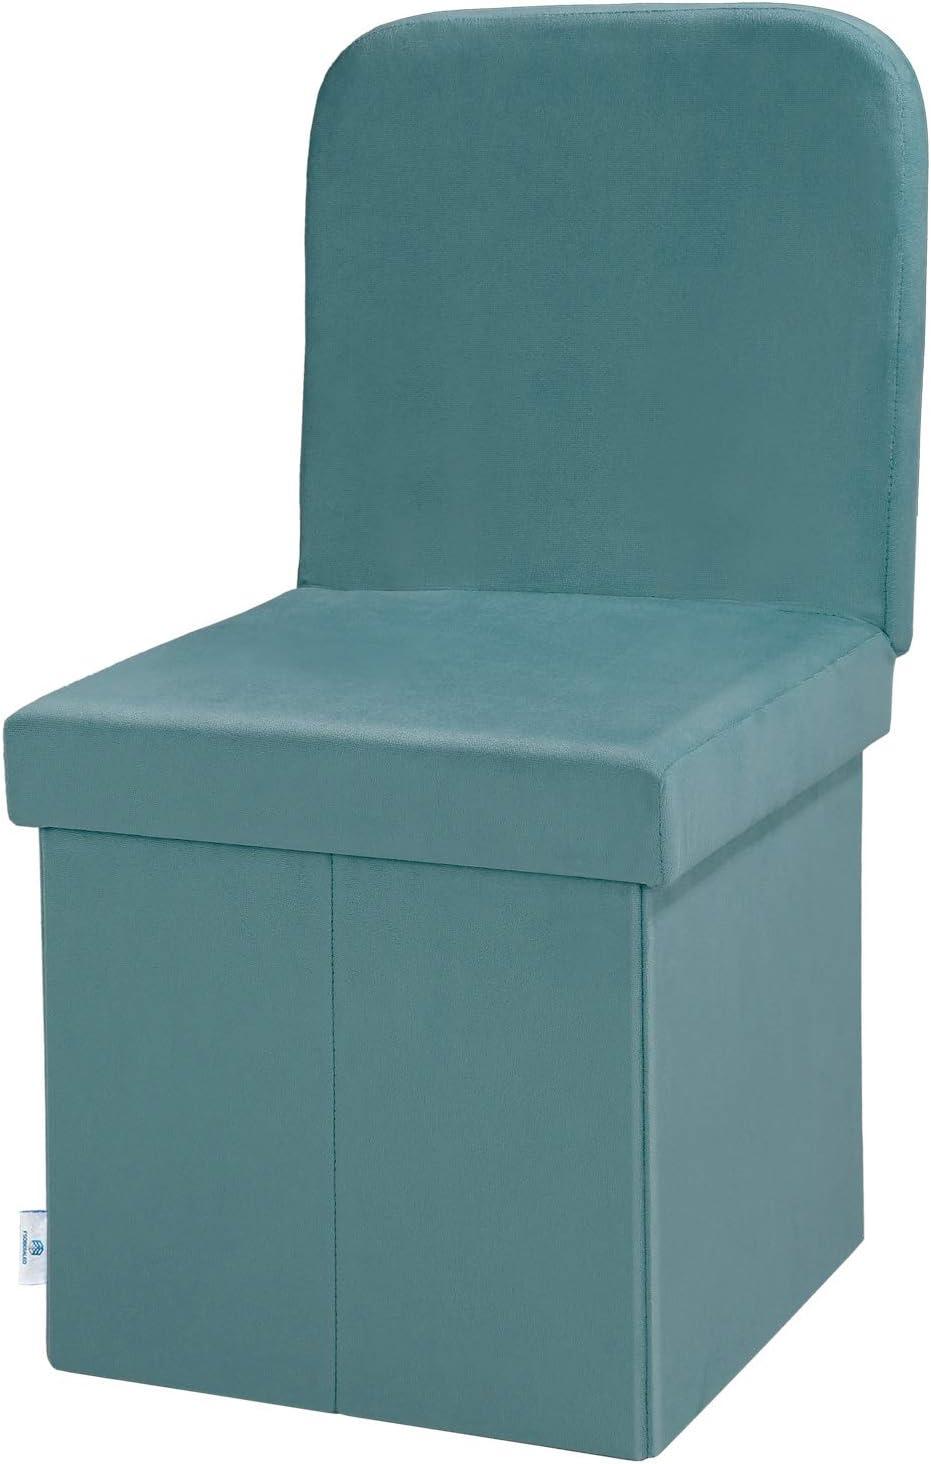 B FSOBEIIALEO Storage Ottoman Velvet with Seat Back, Folding Chair Seat for Living Room, Sturdy Toy Chest Storage Box (Teal, Medium)